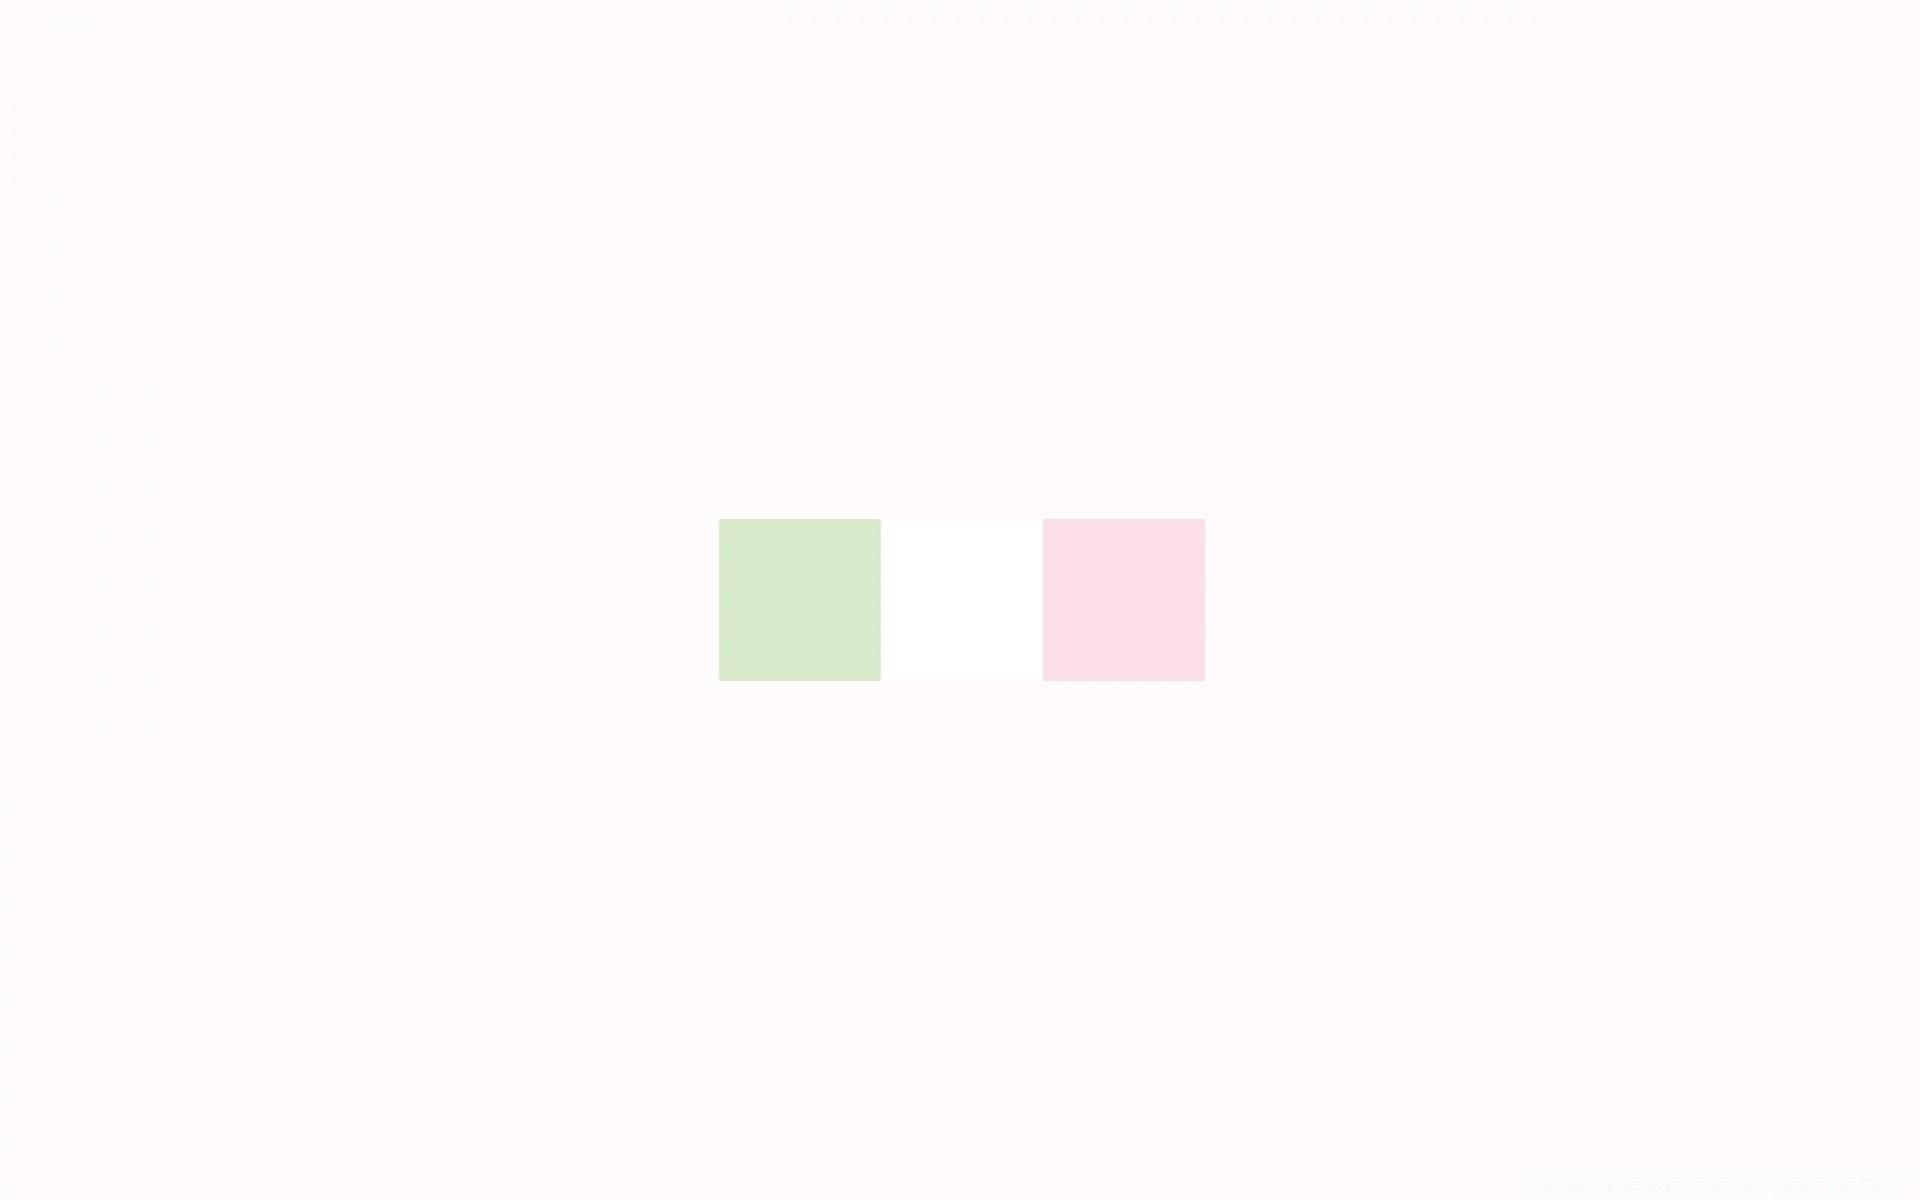 Minimalist White Phone Wallpapers